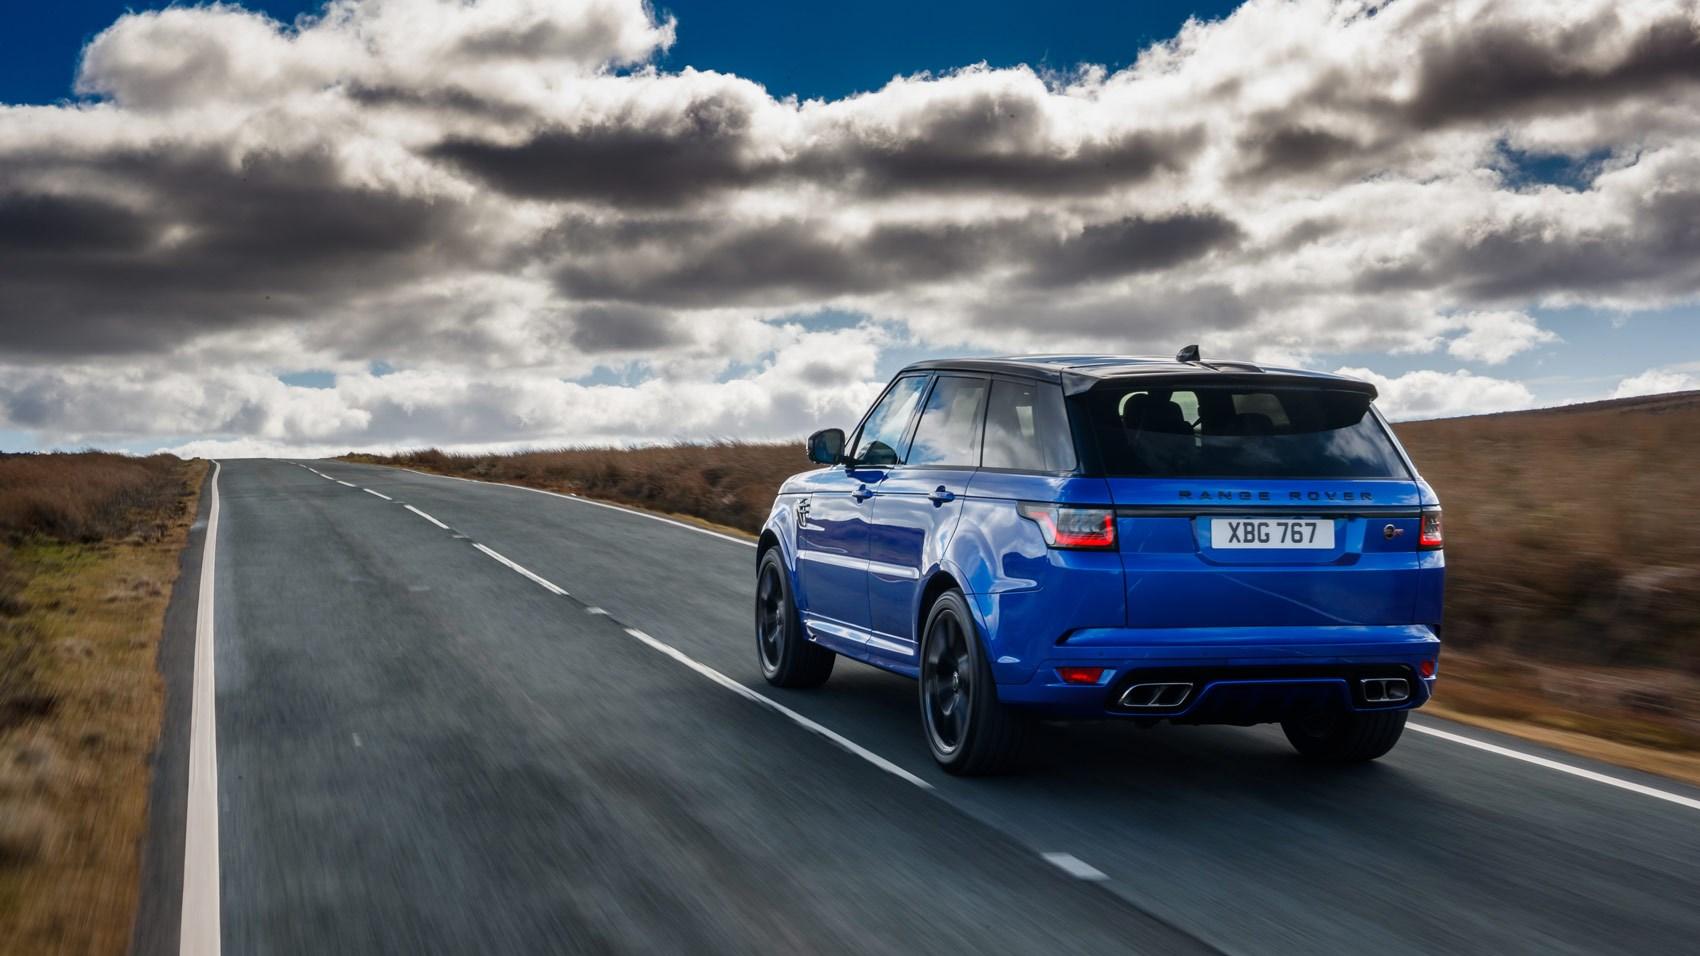 Range Rover Sport SVR 2018 rear